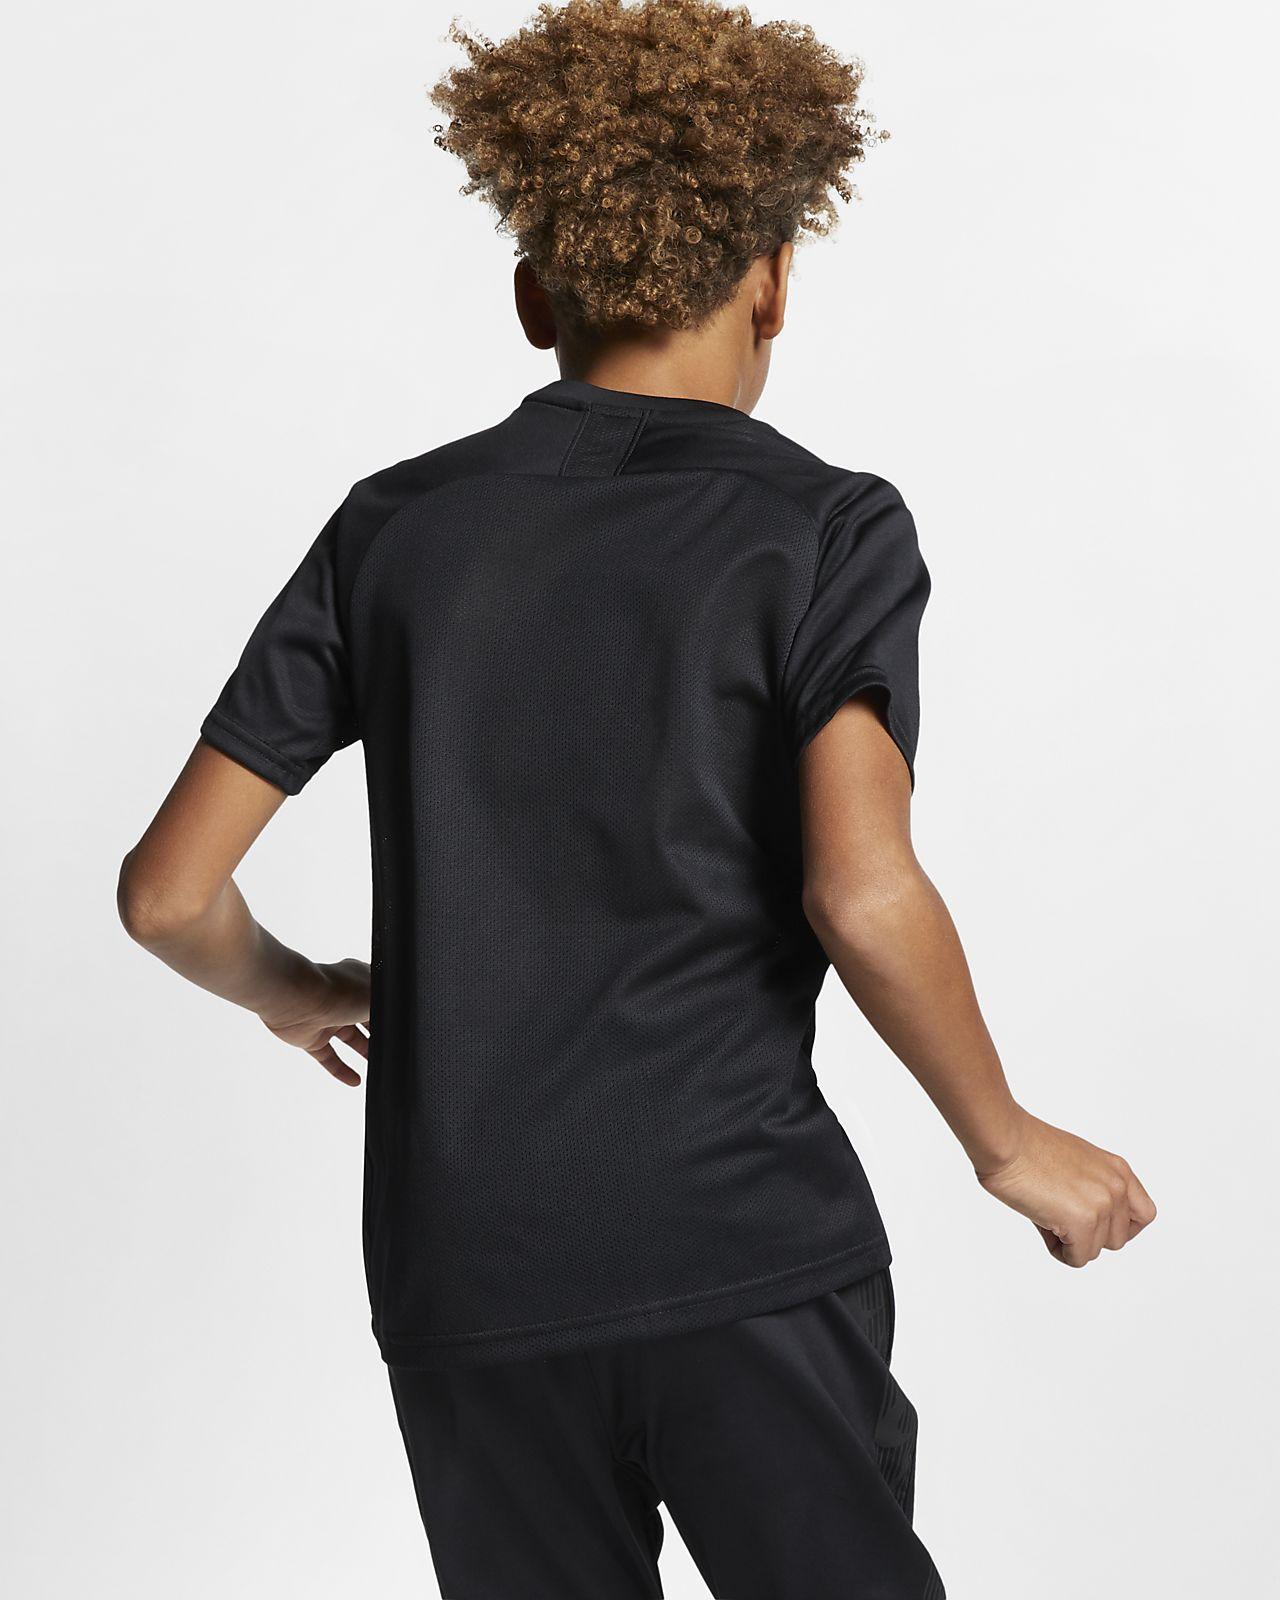 212579391 Nike Dri-FIT Academy Older Kids' Short-Sleeve Football Top. Nike.com GB